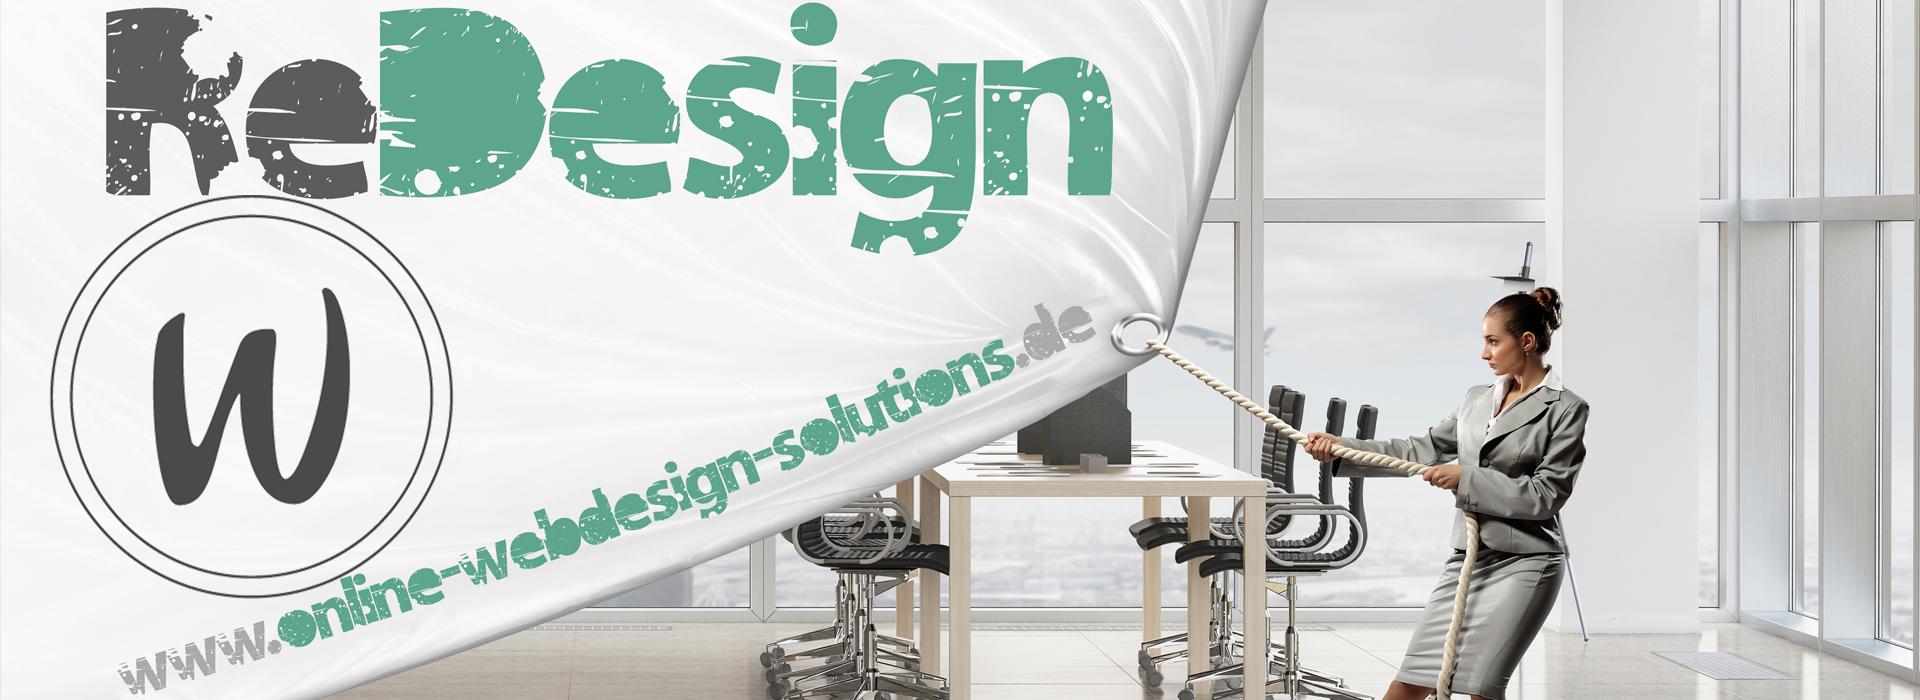 Webdesign Bergkamen